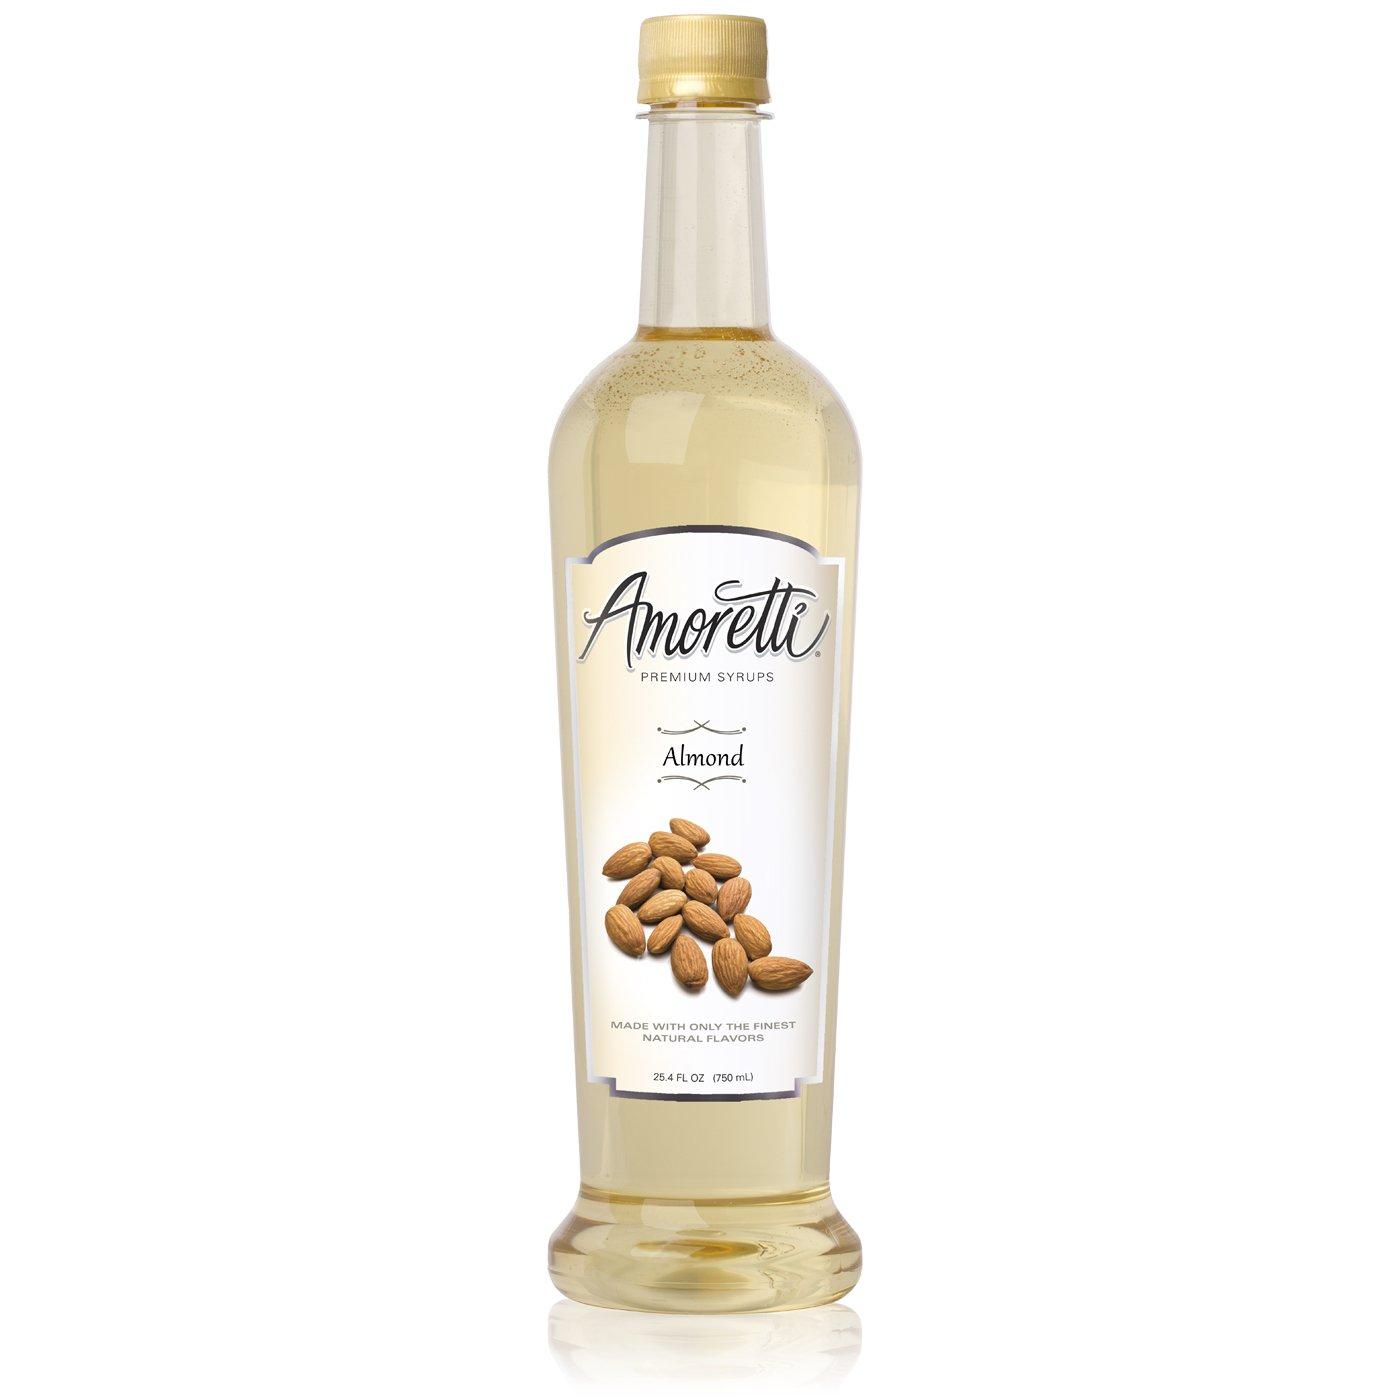 Amoretti Premium Syrup, Almond Orgeat, 25.4 Ounce